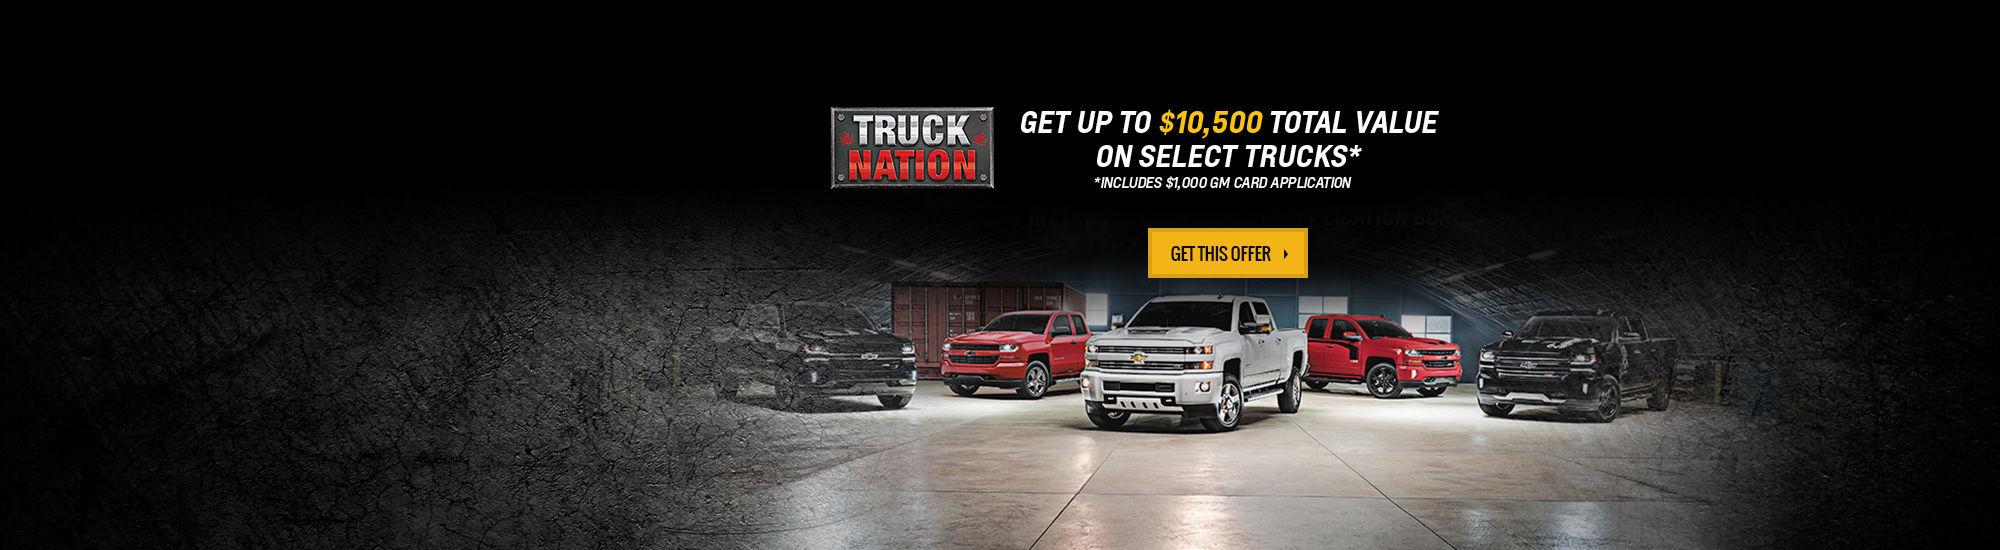 Truck Nation !